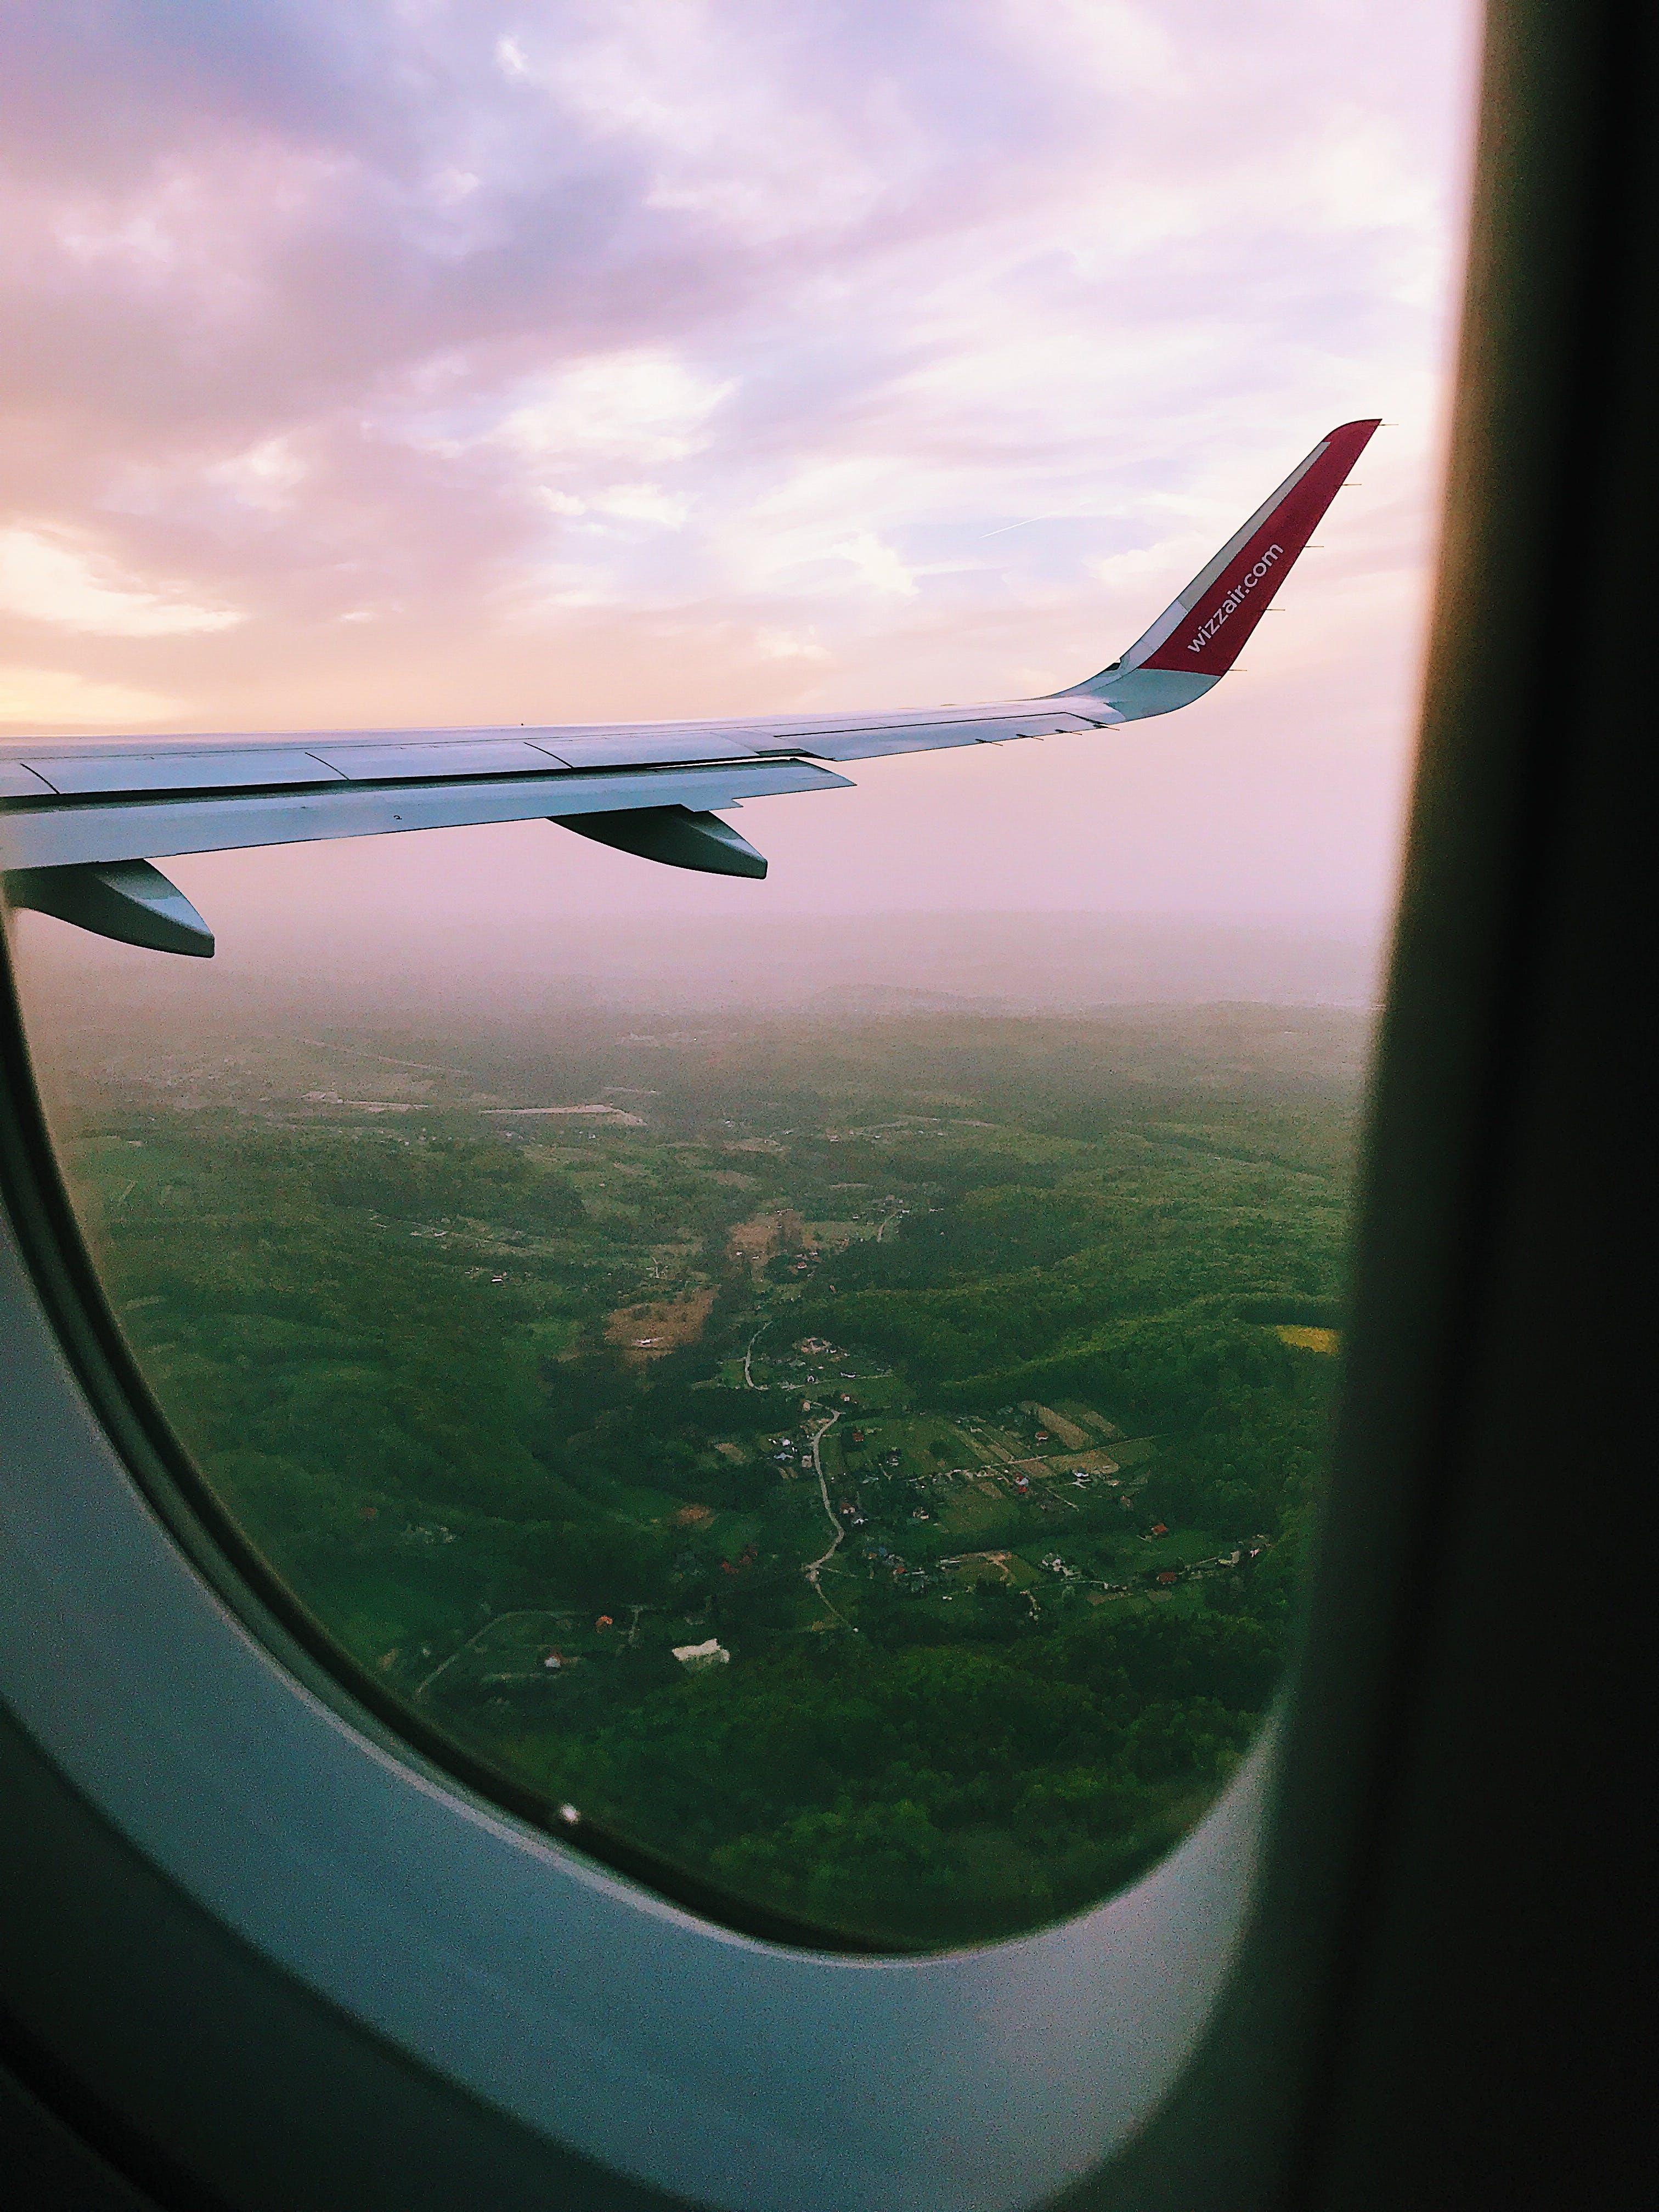 Plane Window Across Bent Plane Wing